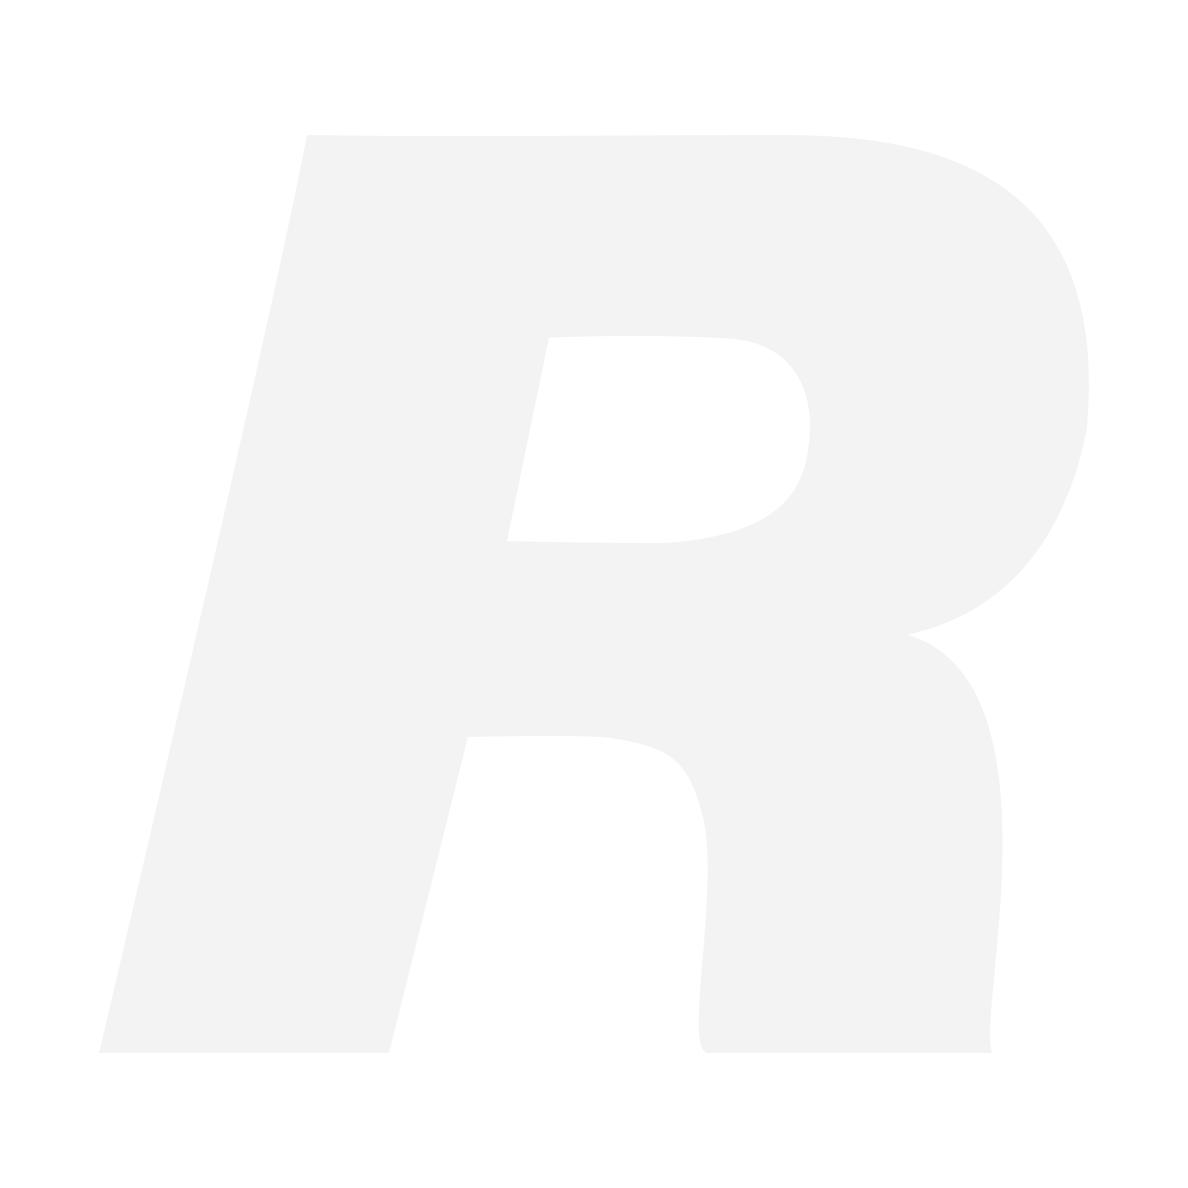 CONTOUR Design RollerMouse Free3 Wireless